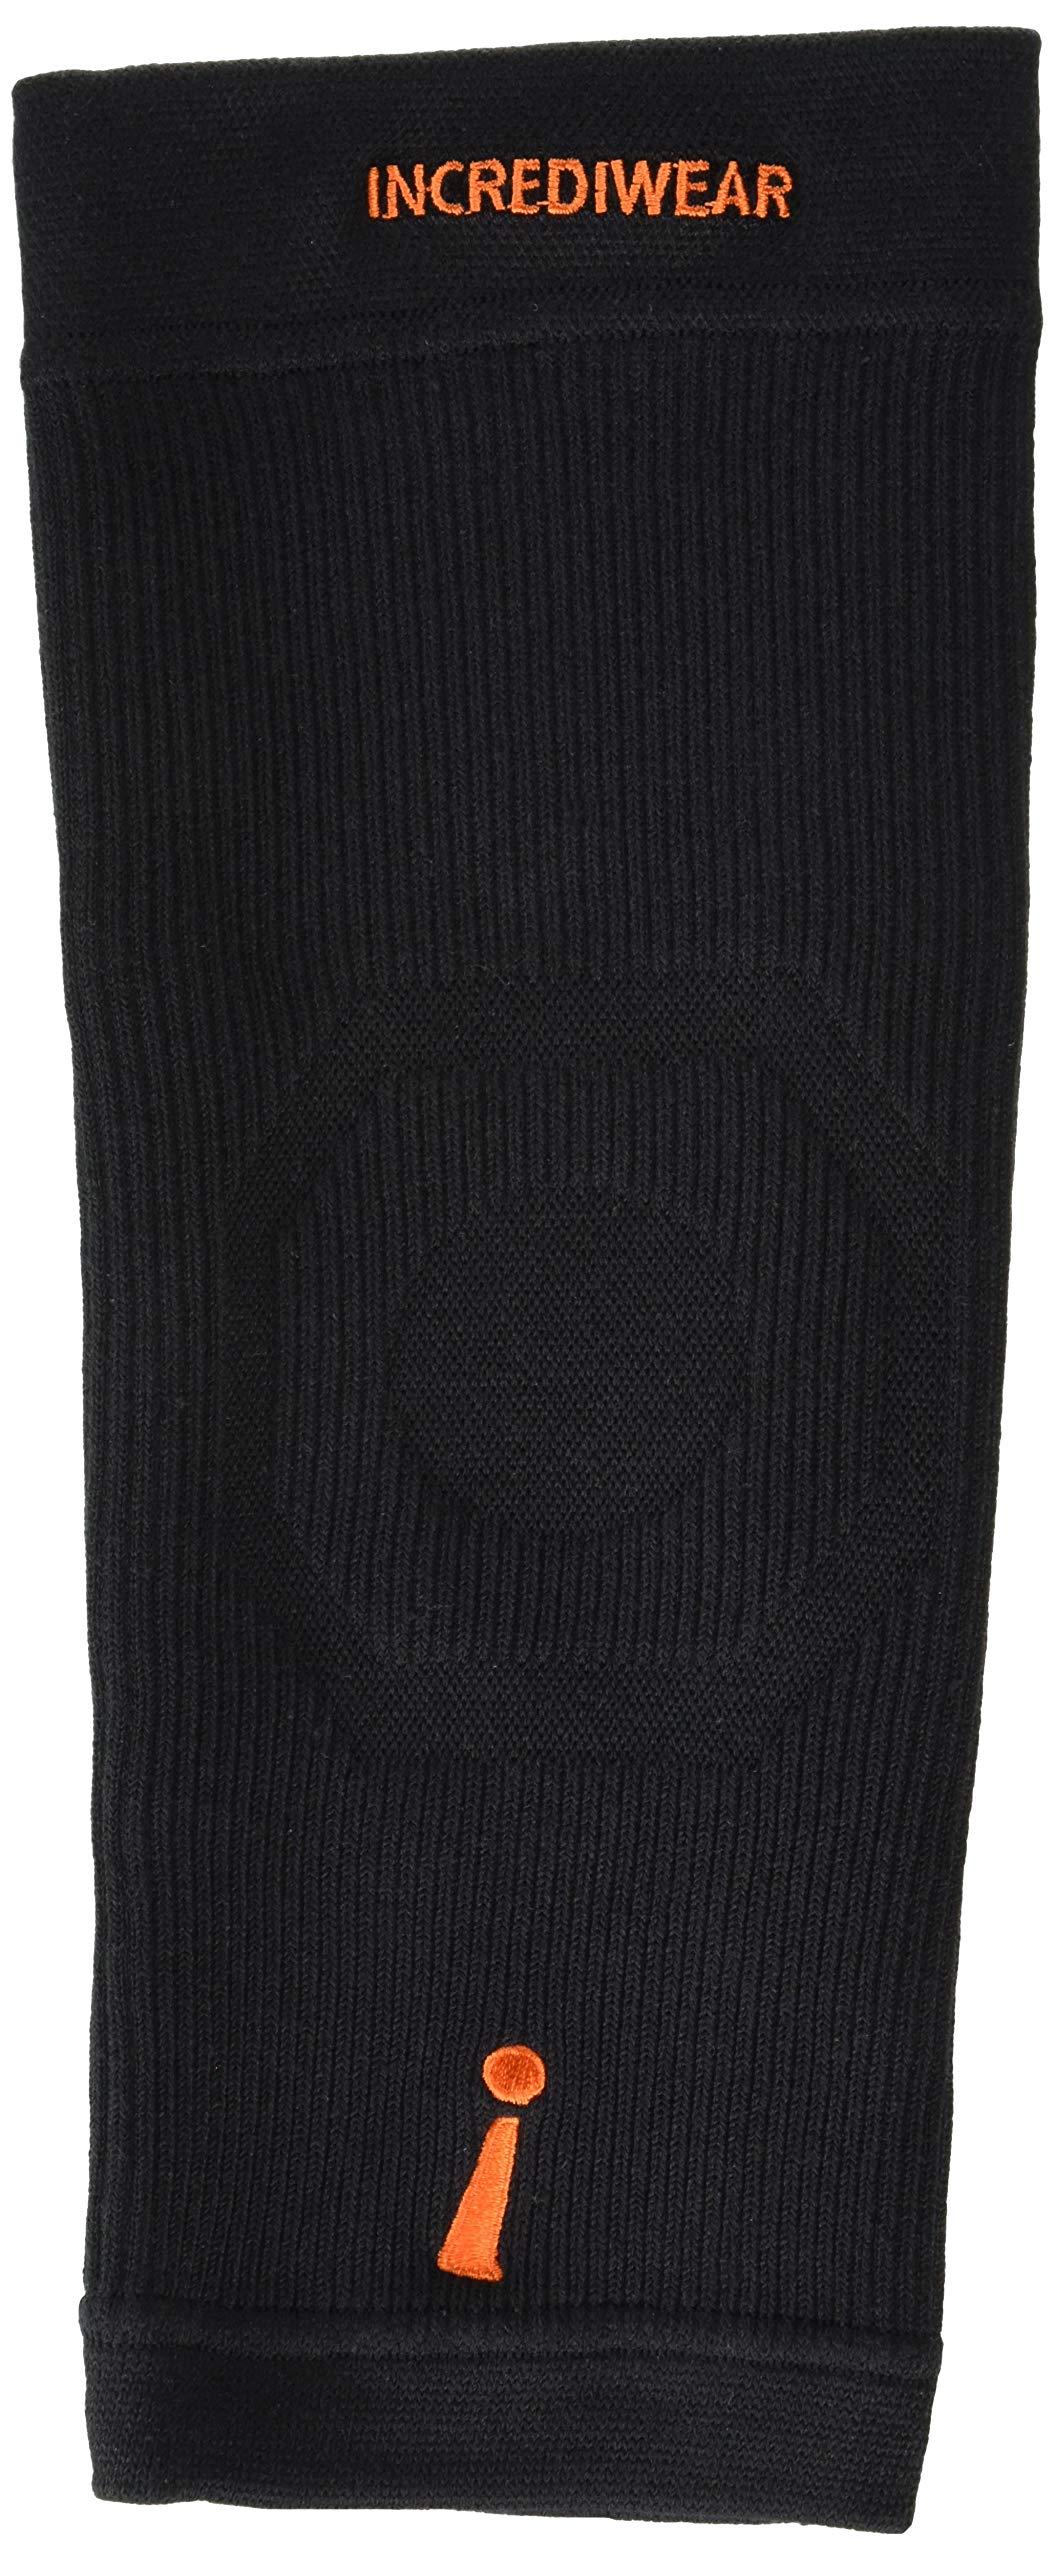 INCREDIWEAR Knee Sleeve, Black, Large, 0.03 Pound